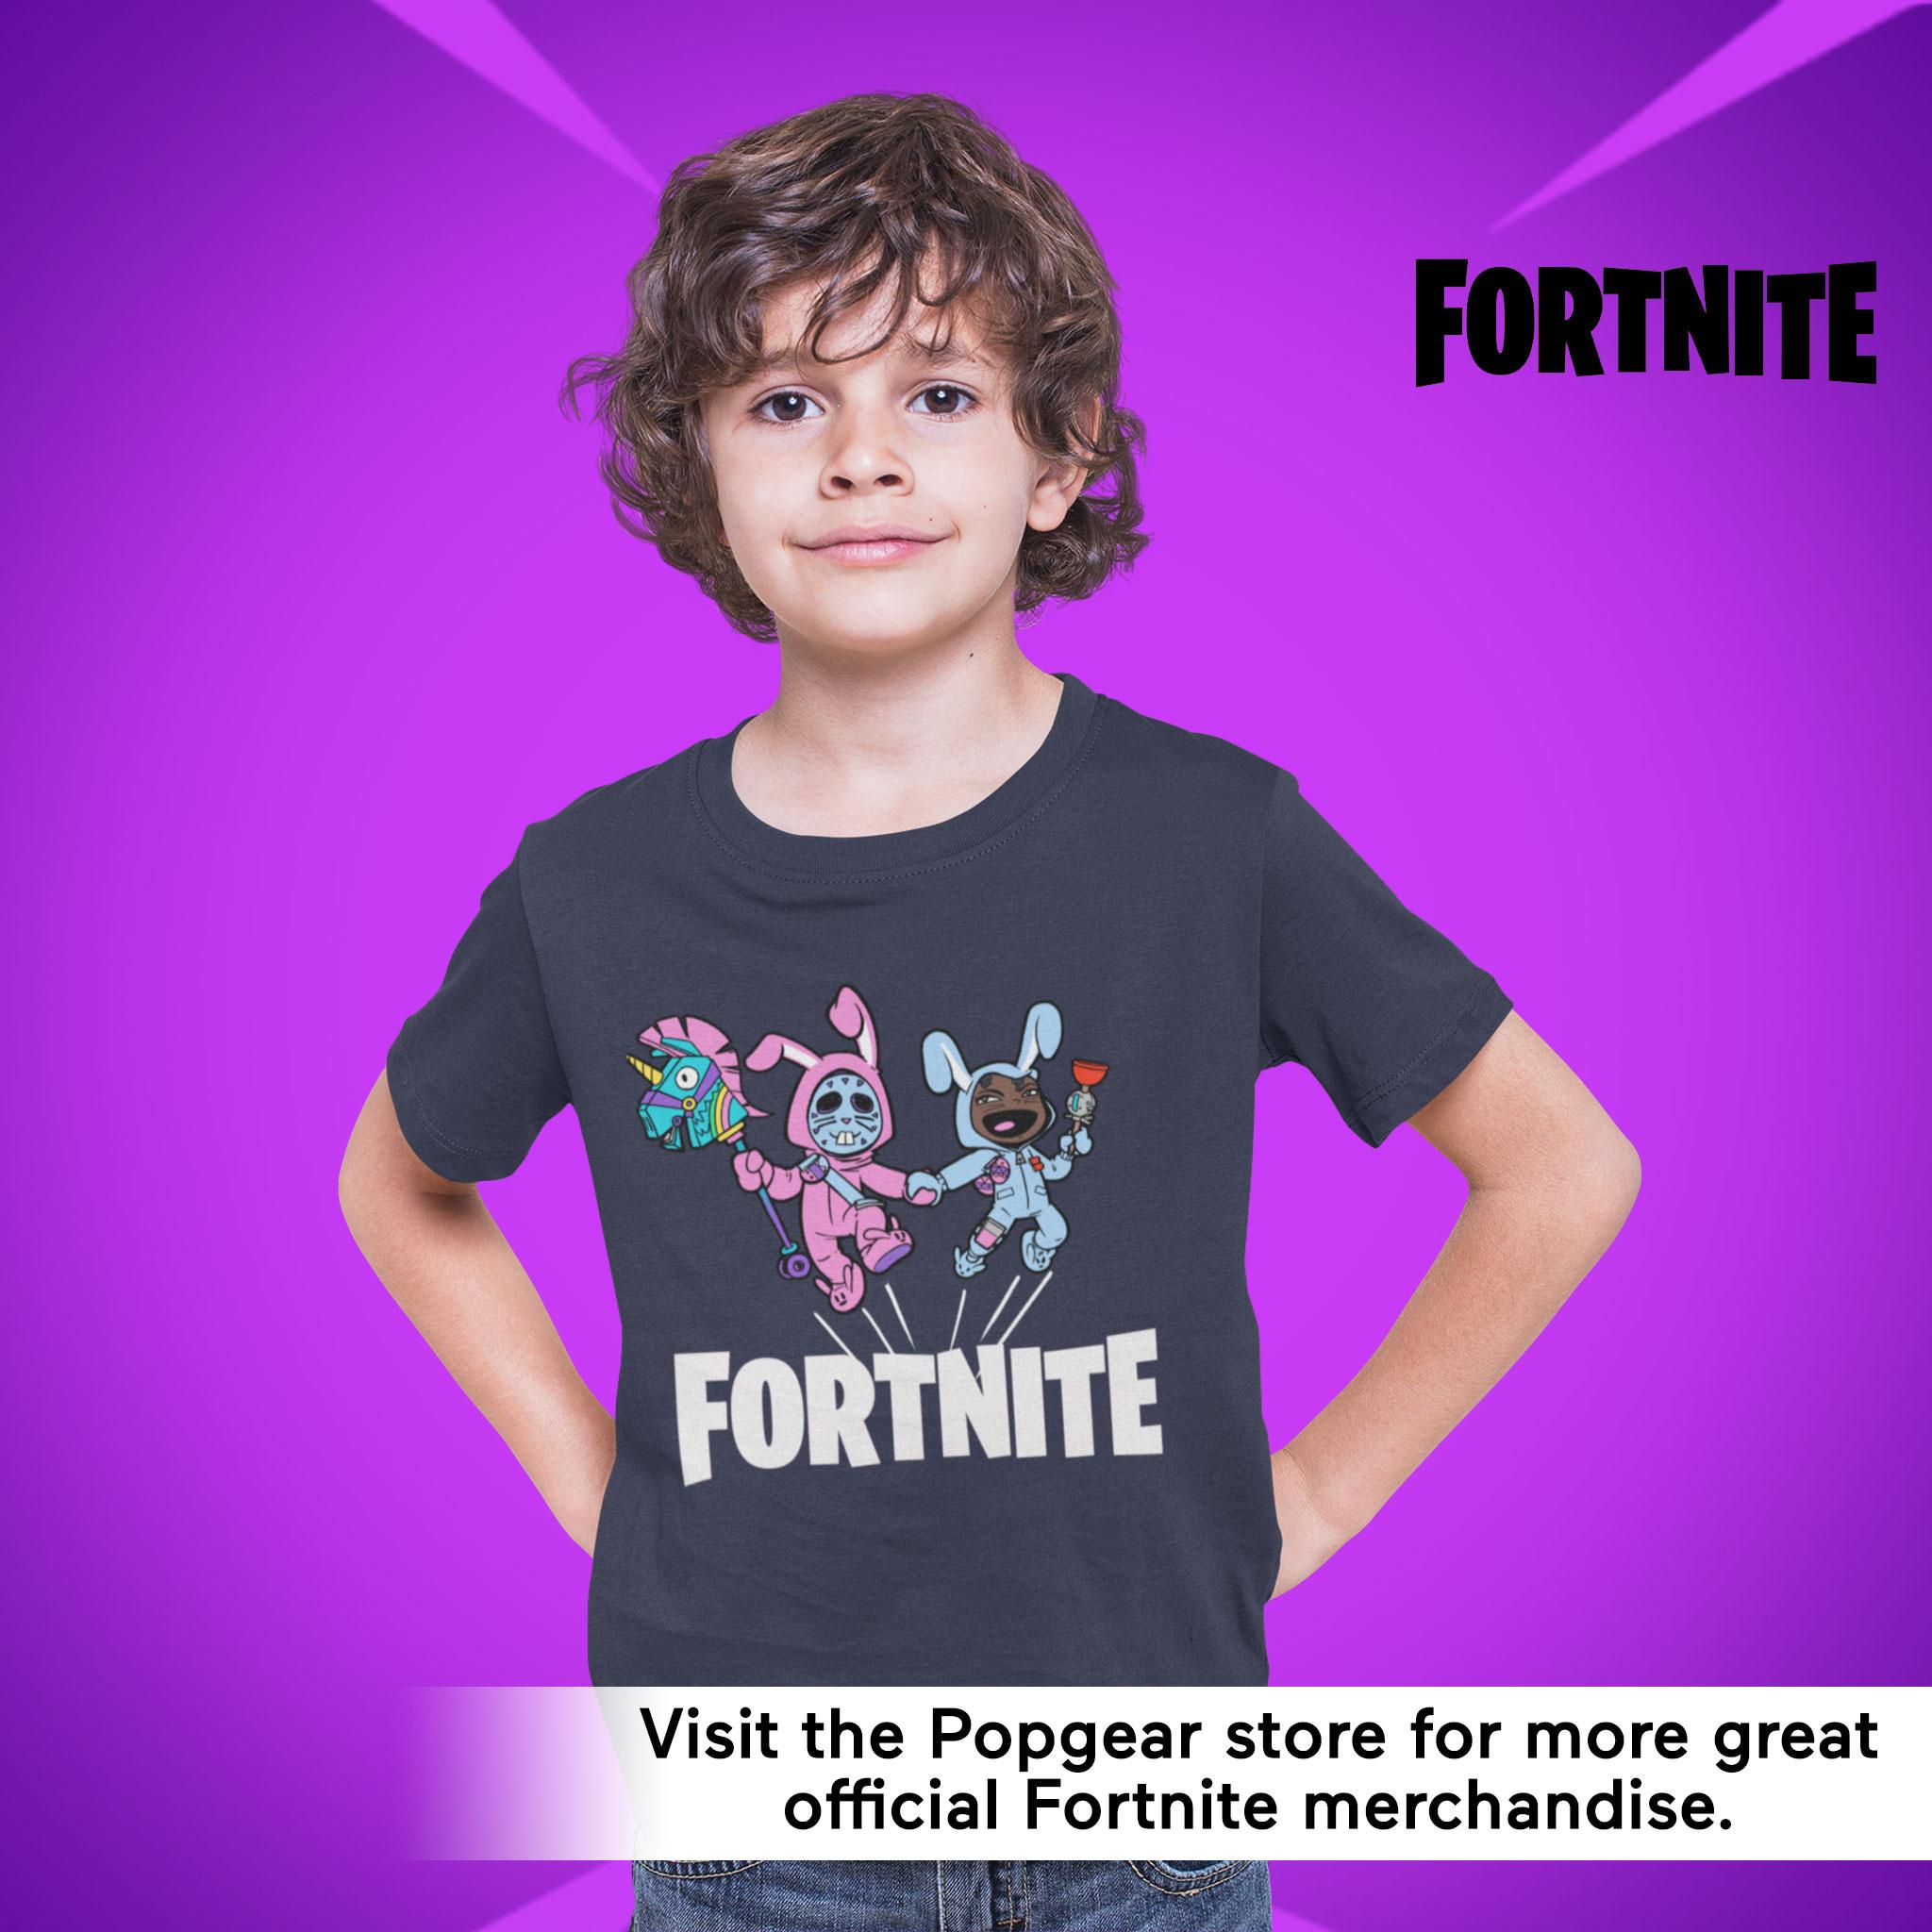 miniature 18 - Boys Fortnite T Shirt Bunny Trouble Official Merchandise